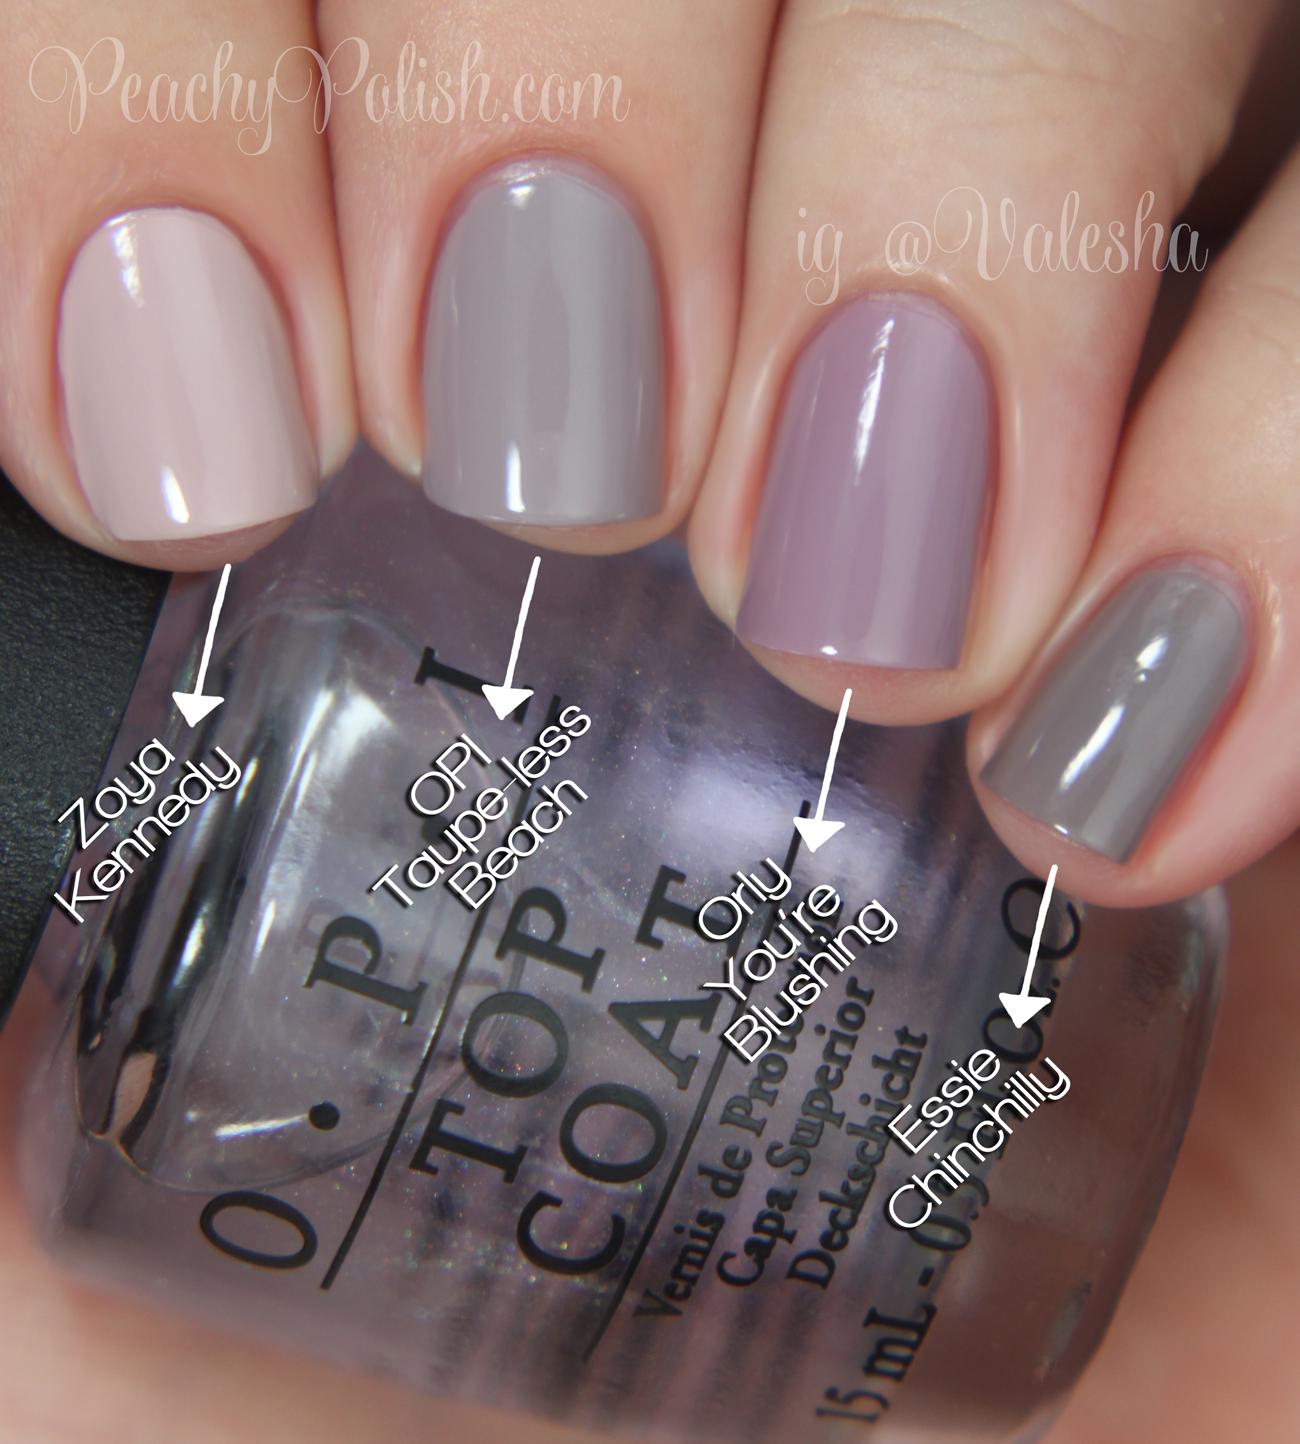 OPI Taupe-less Beach Comparison - Peachy Polish | Nail polish ...